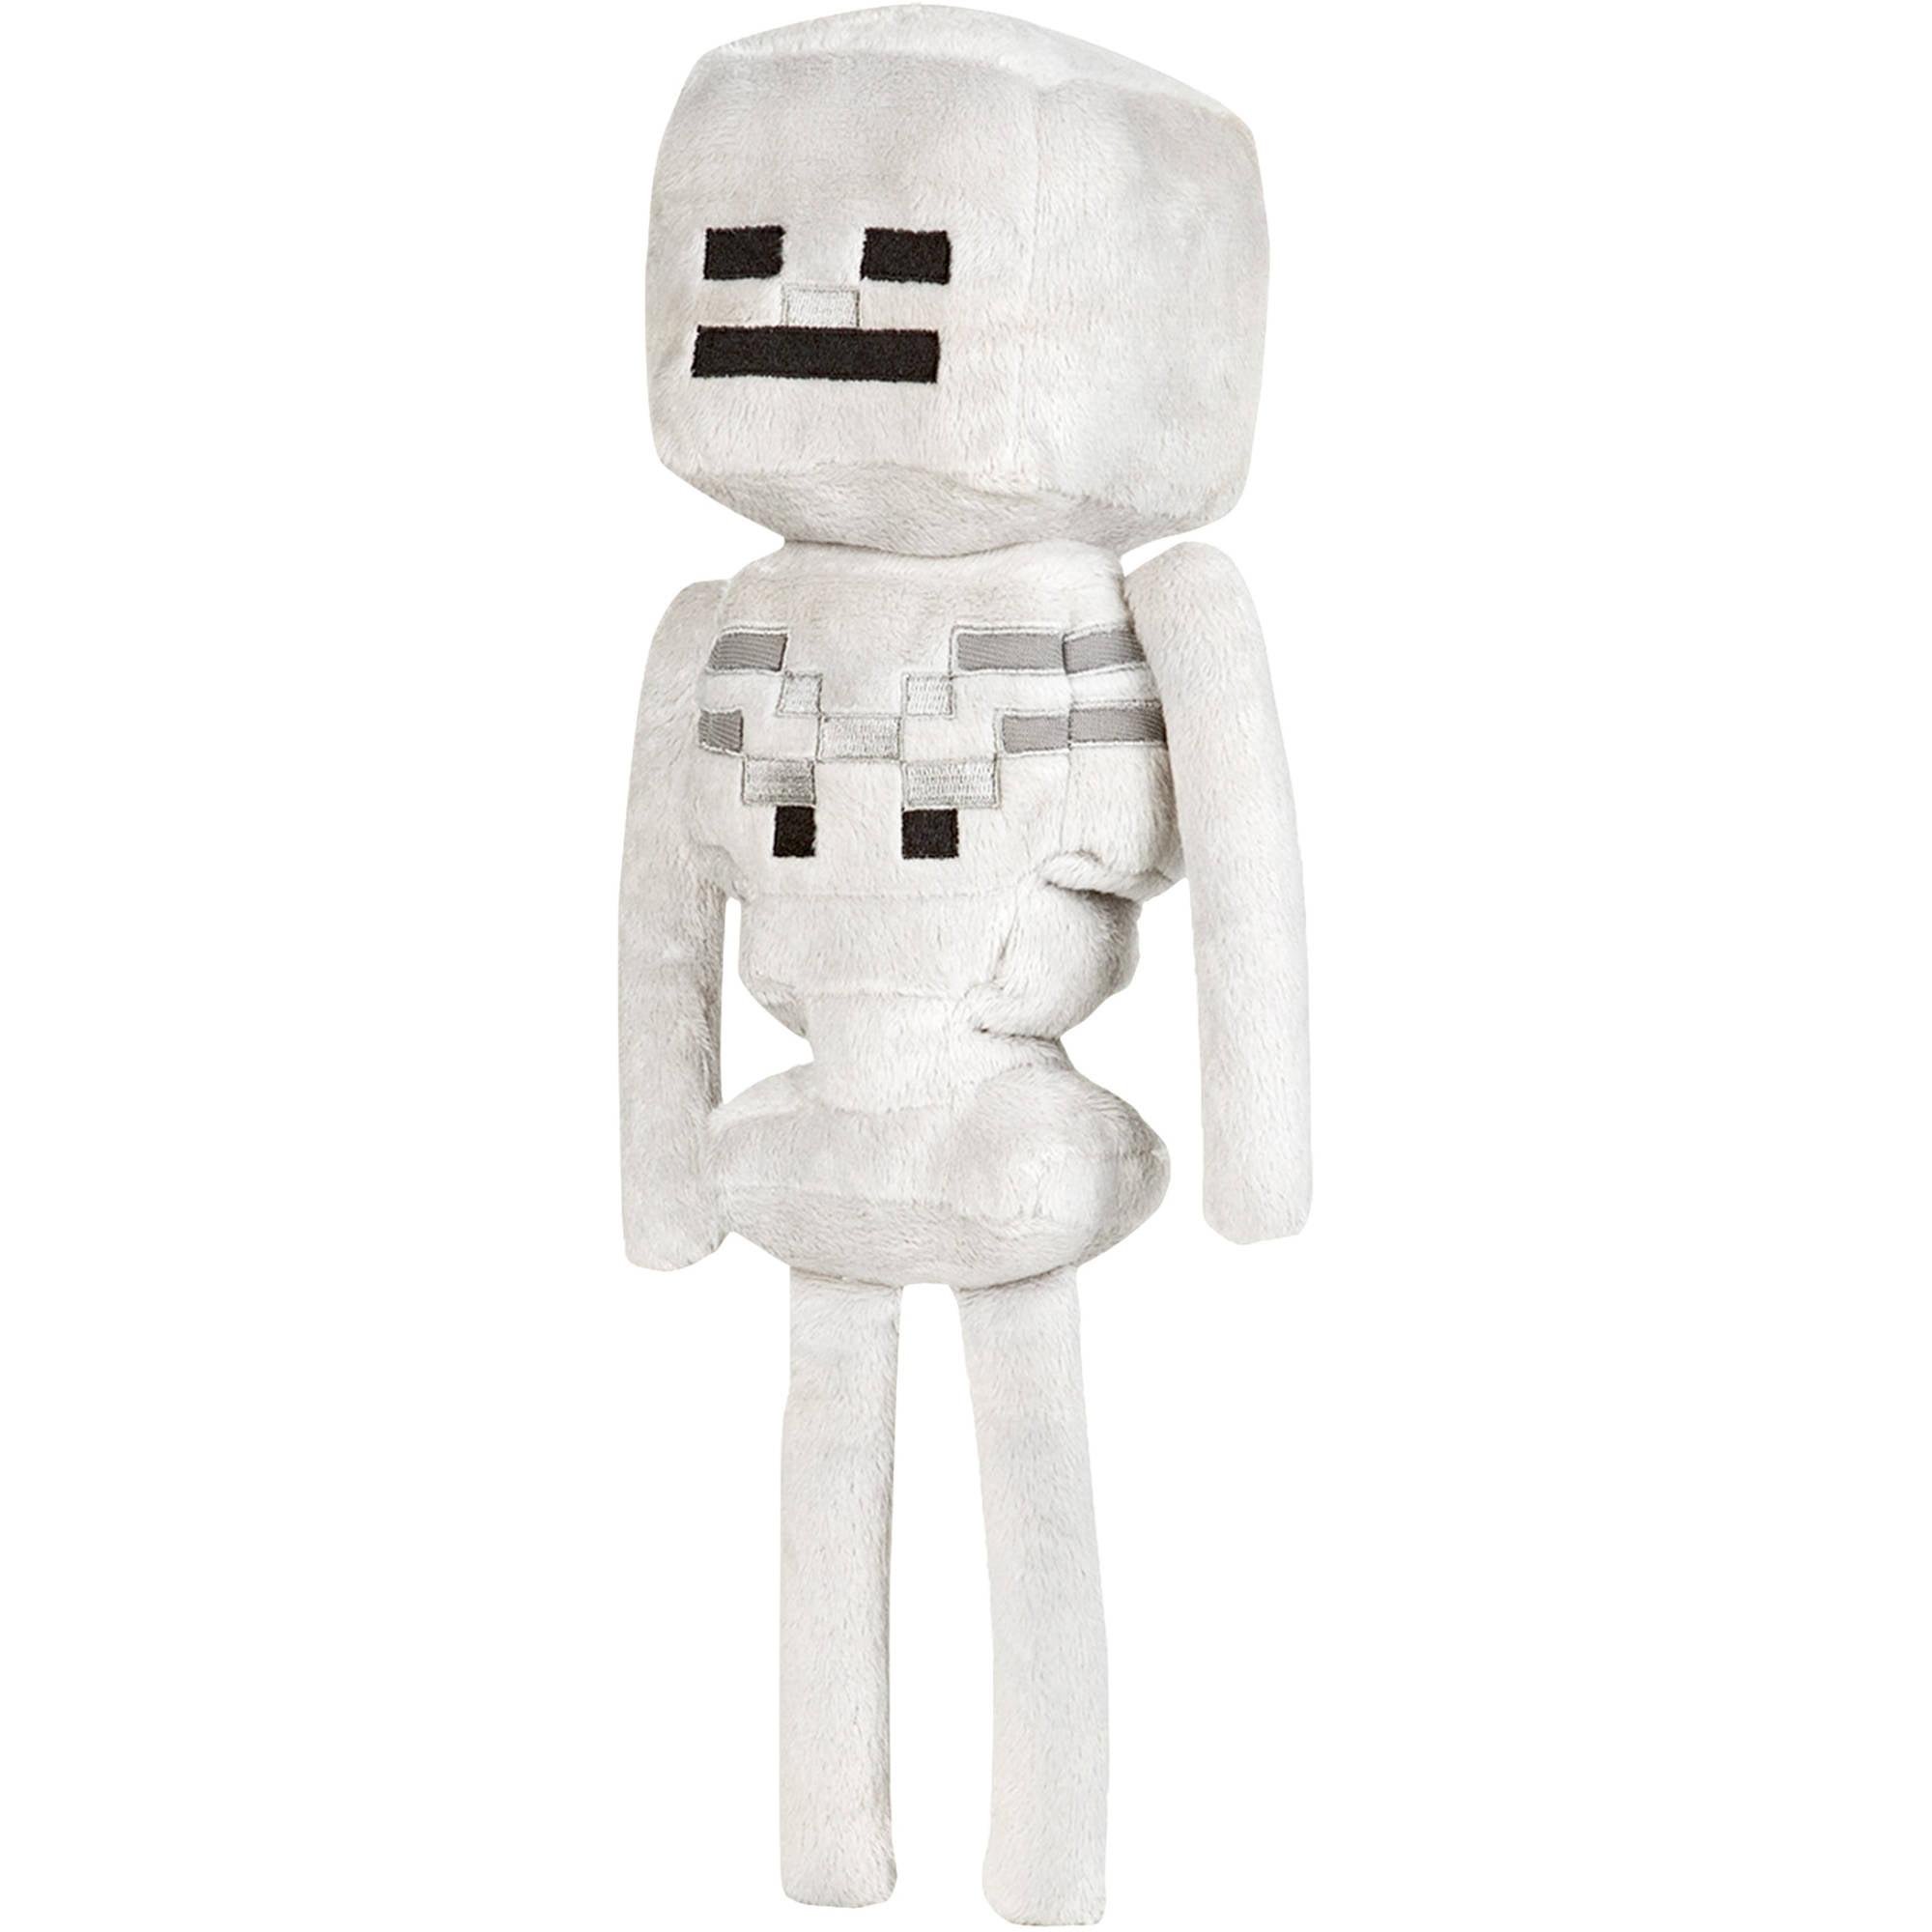 Minecraft Medium Plush, Skeleton   Walmart.com